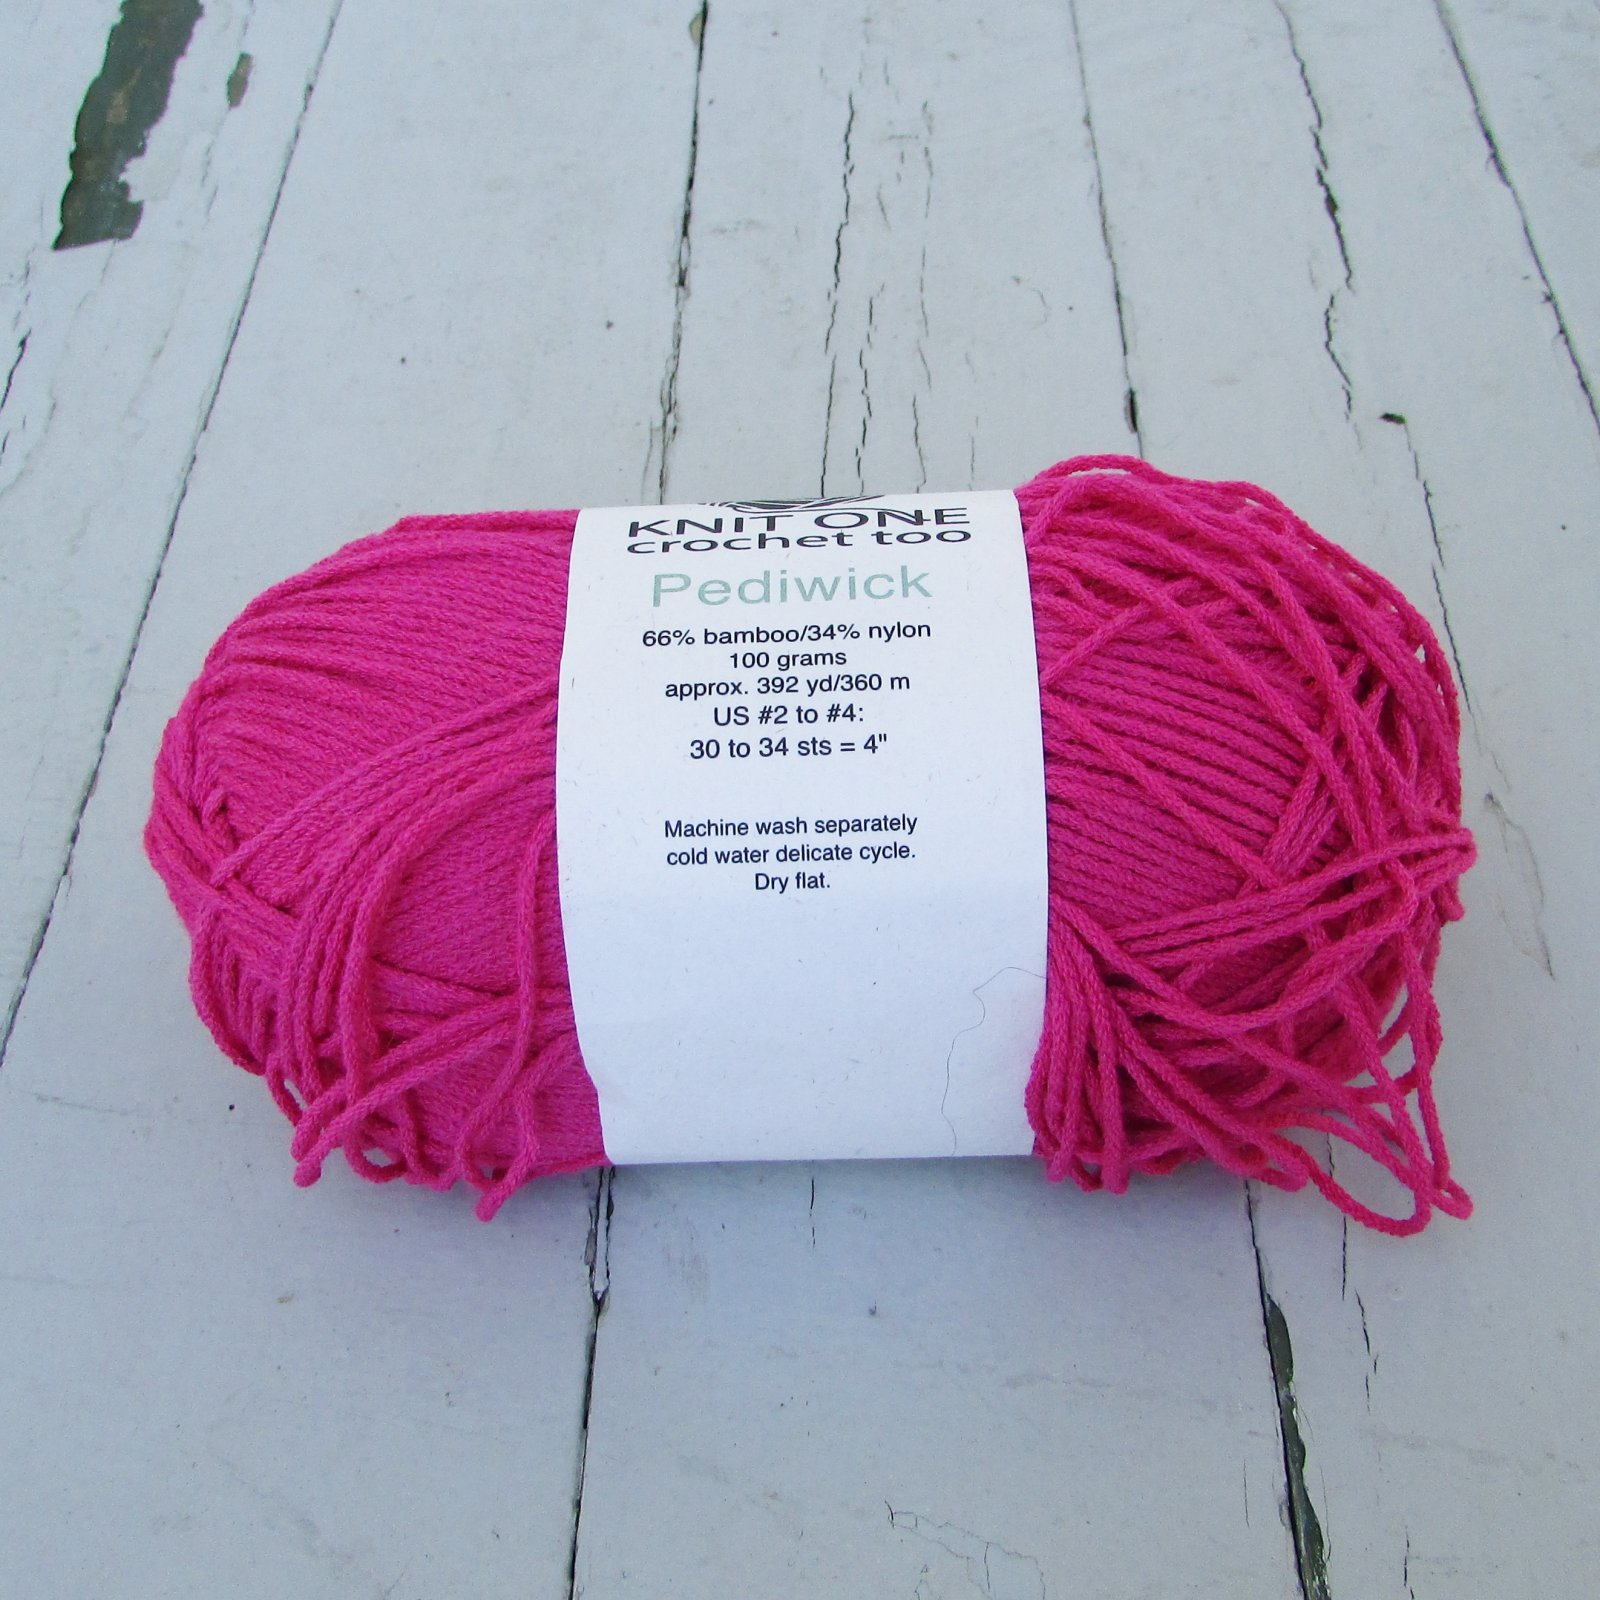 Knit One Crochet Too Pediwick